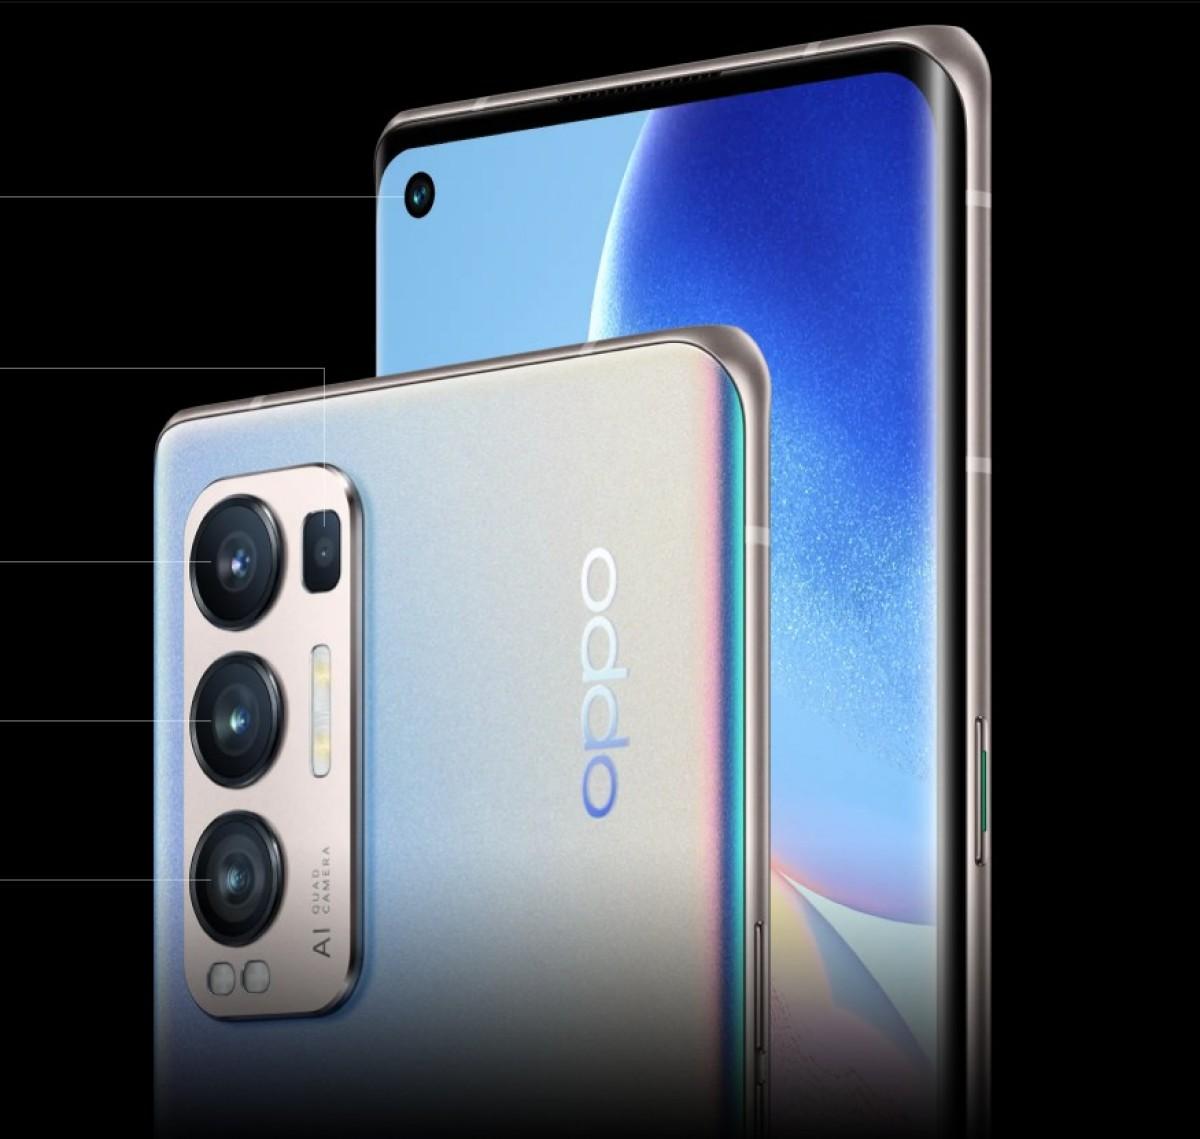 هاتف Oppo Reno 5 Pro  بكاميرا رئيسية  50MP